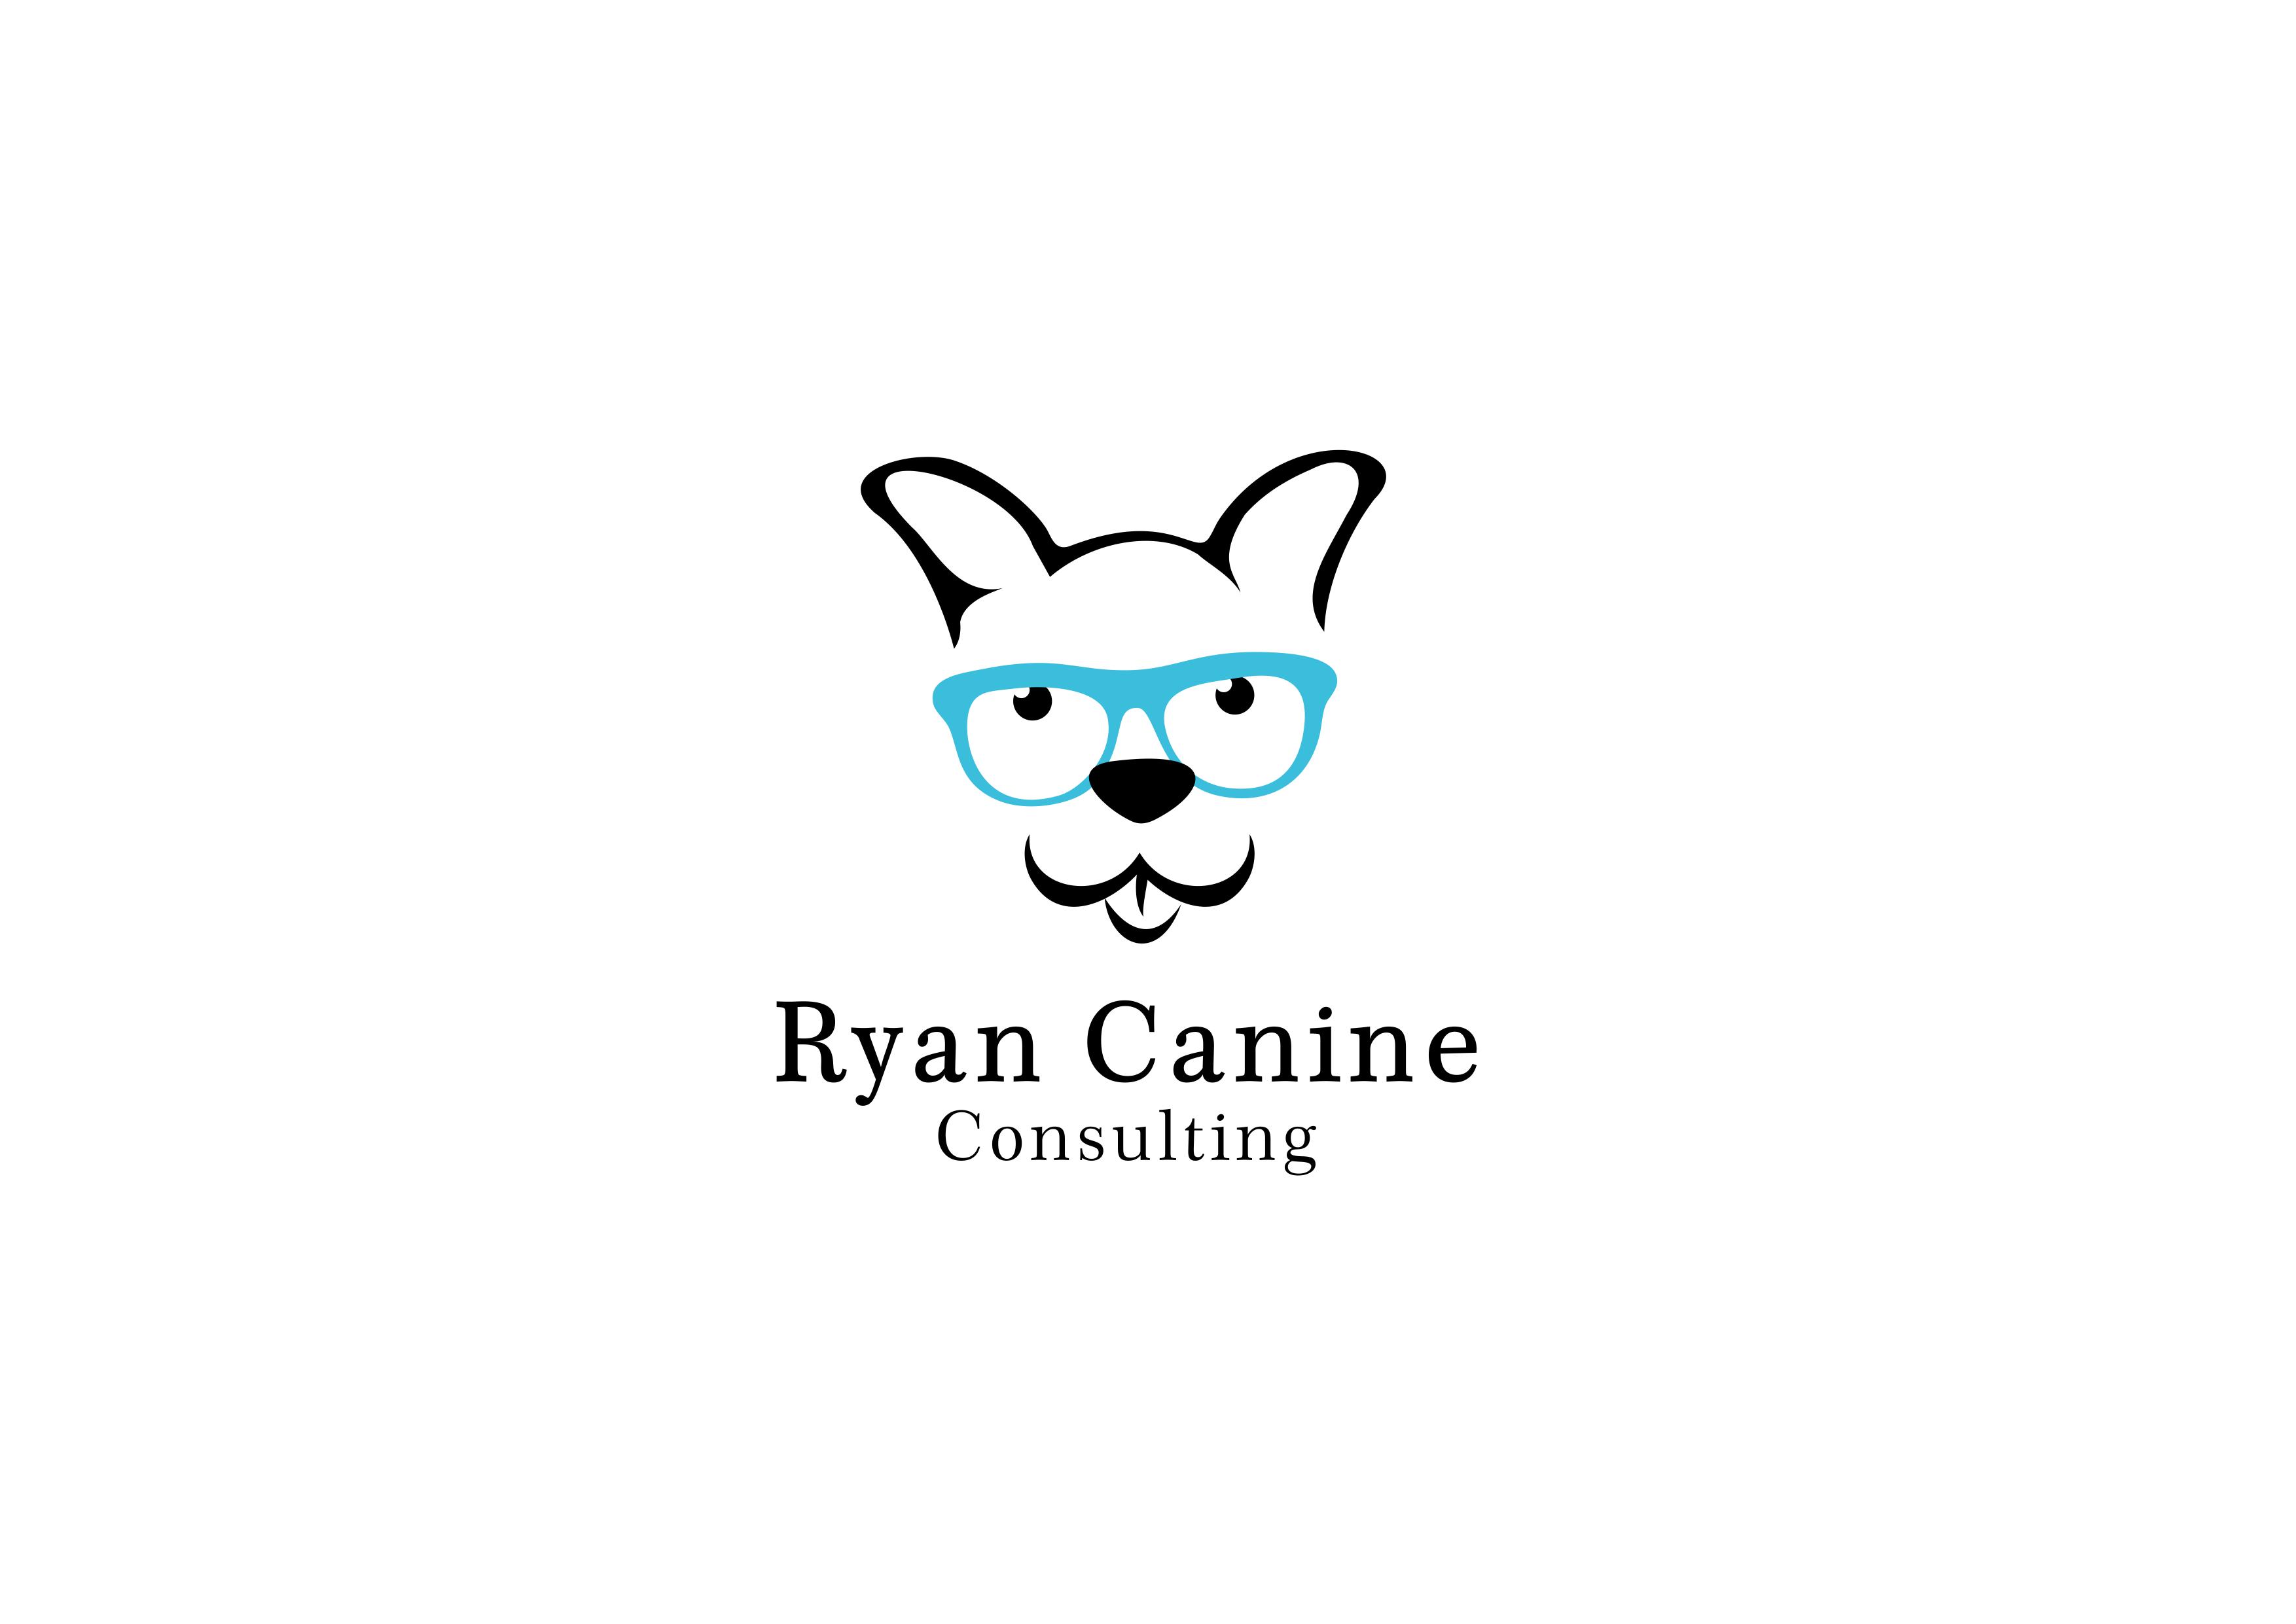 Logo Design 393 Ryan Canine Consulting Design Project Designcontest Logo Design